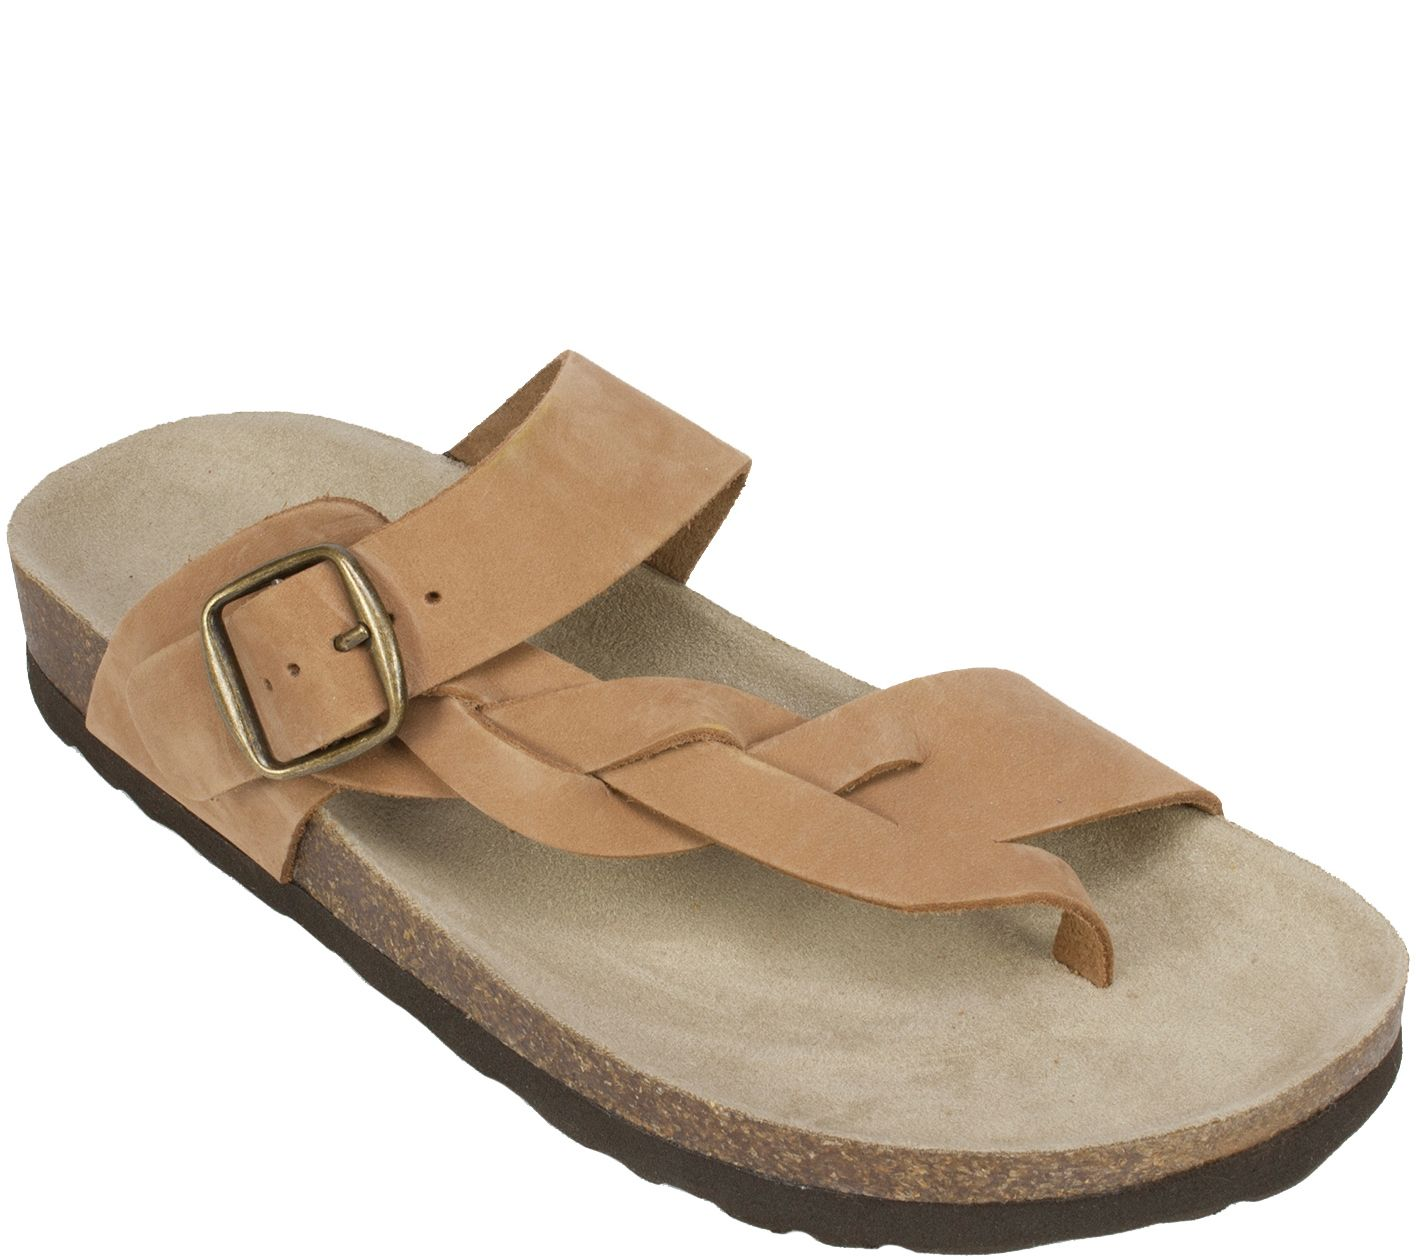 Qvc White Mountain Shoes